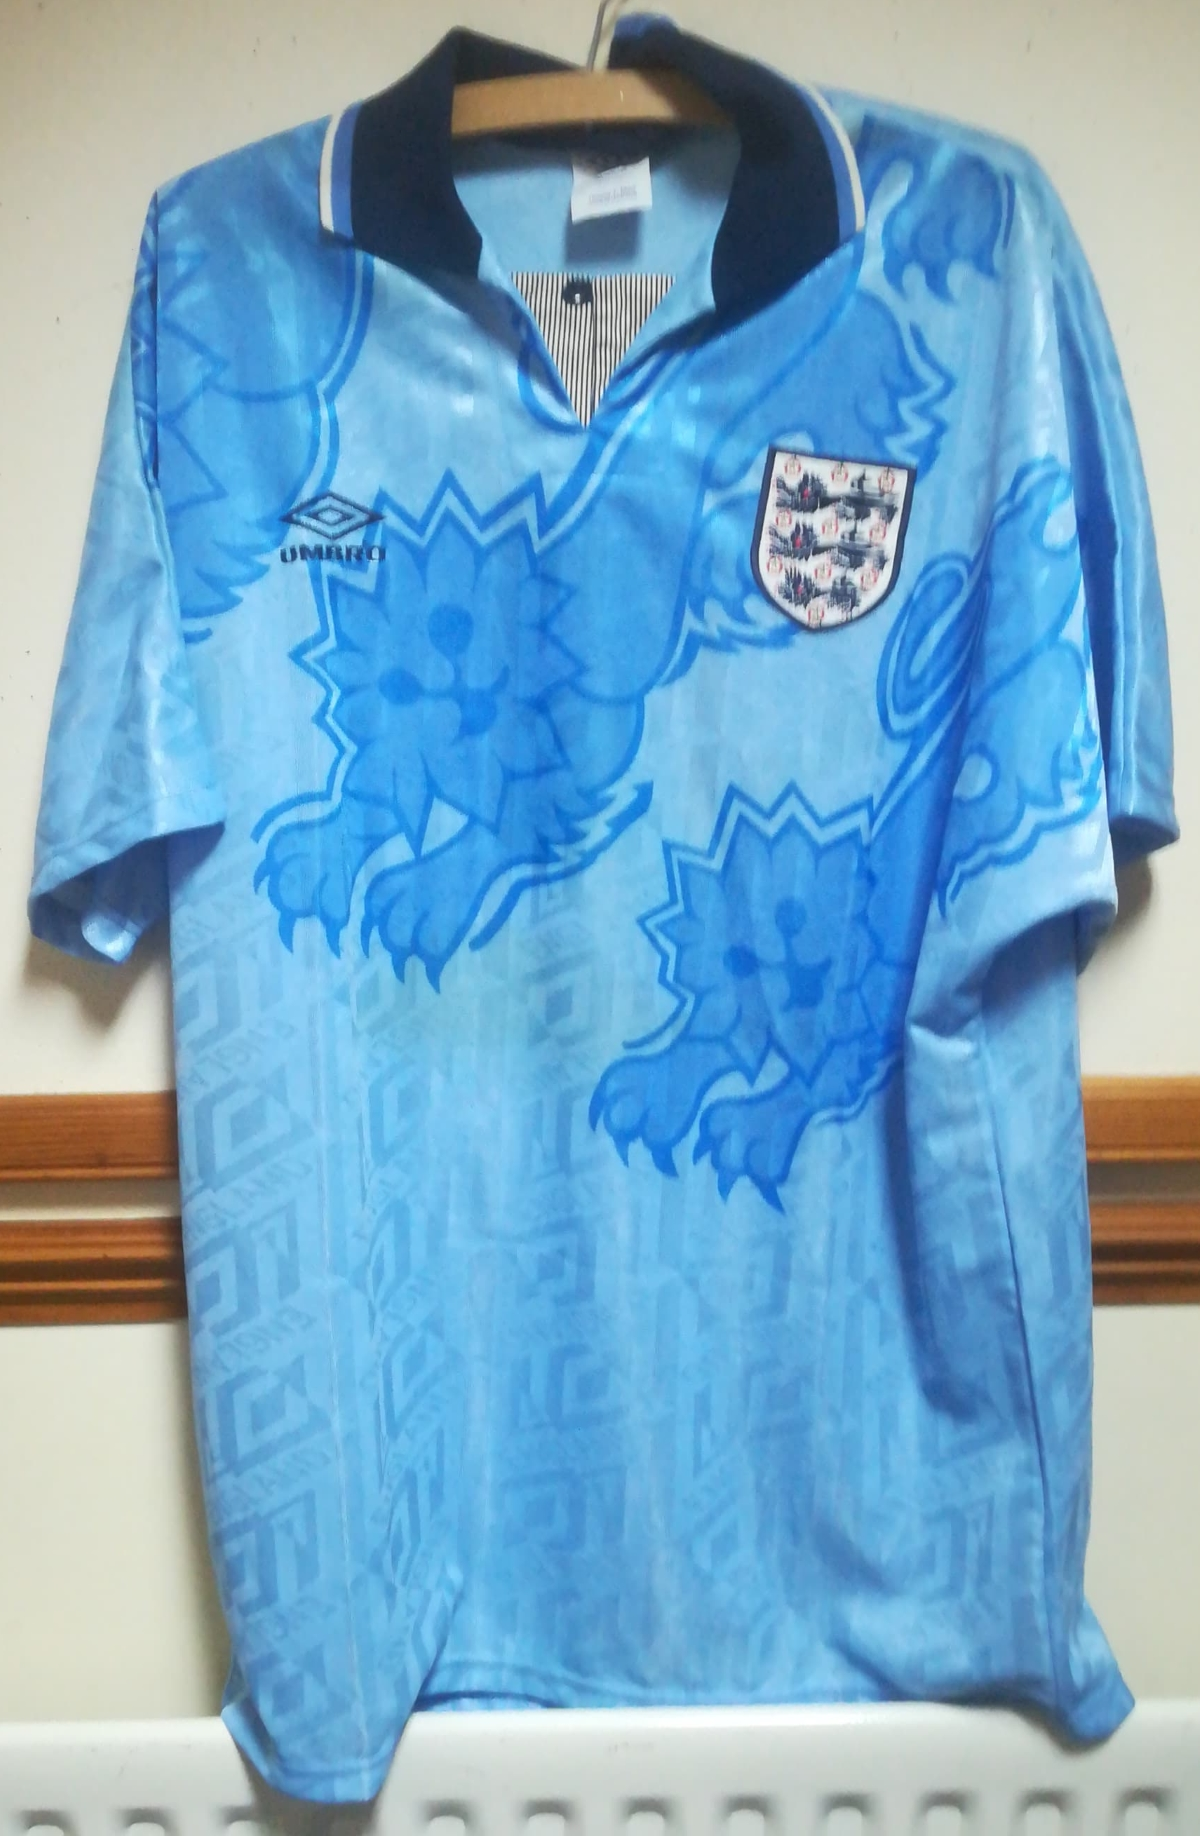 England matchworn shirt collector values